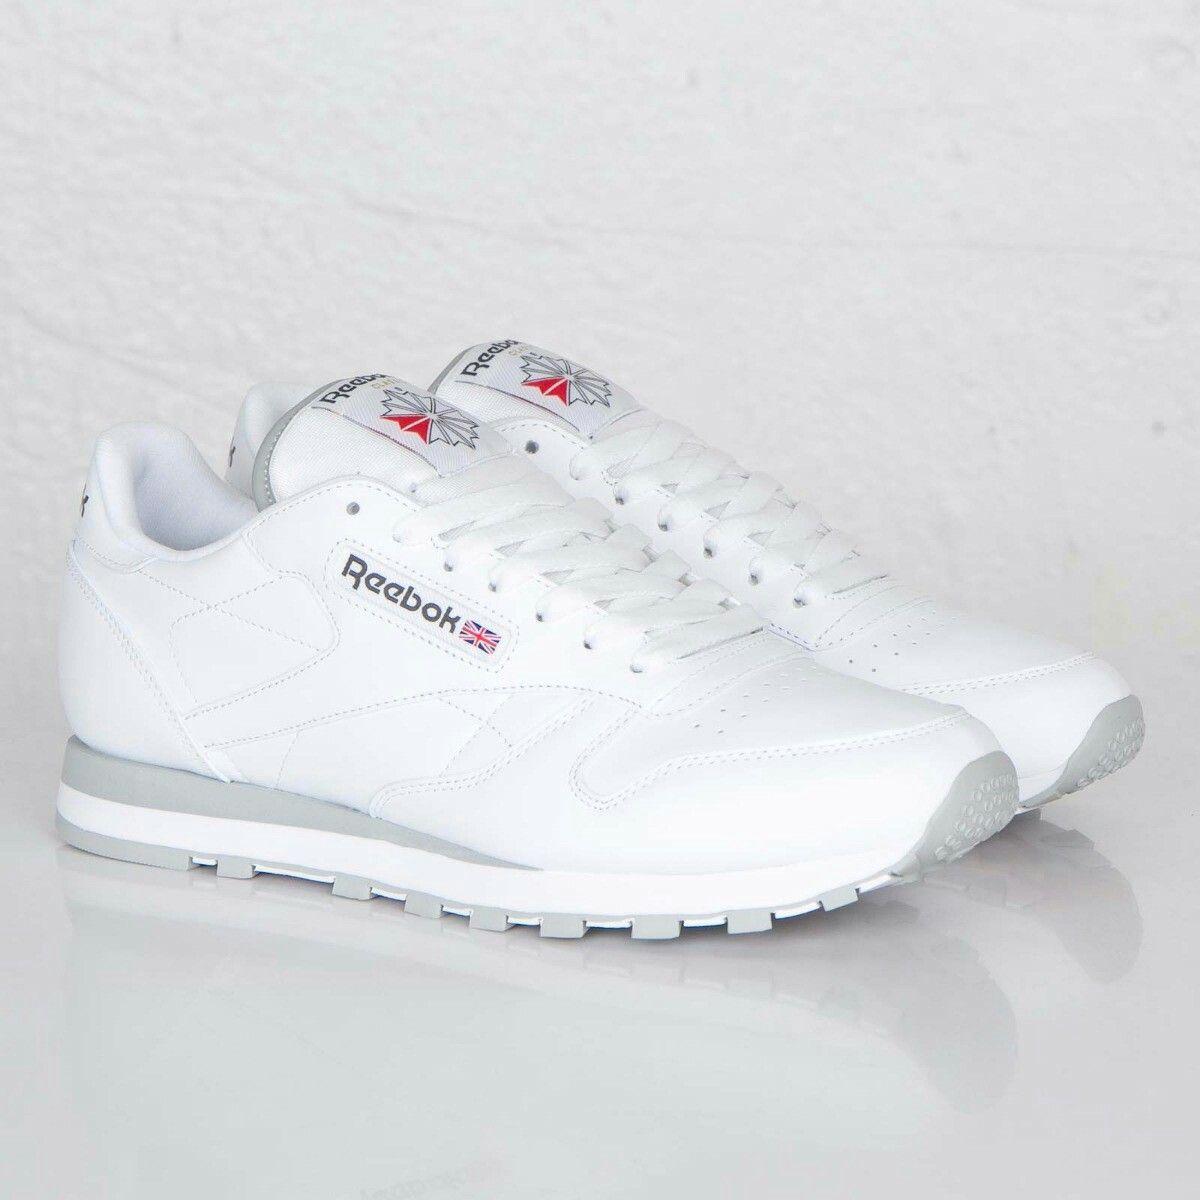 Rebook classic tenis | Rebook tenis, Zapatos y Tenis